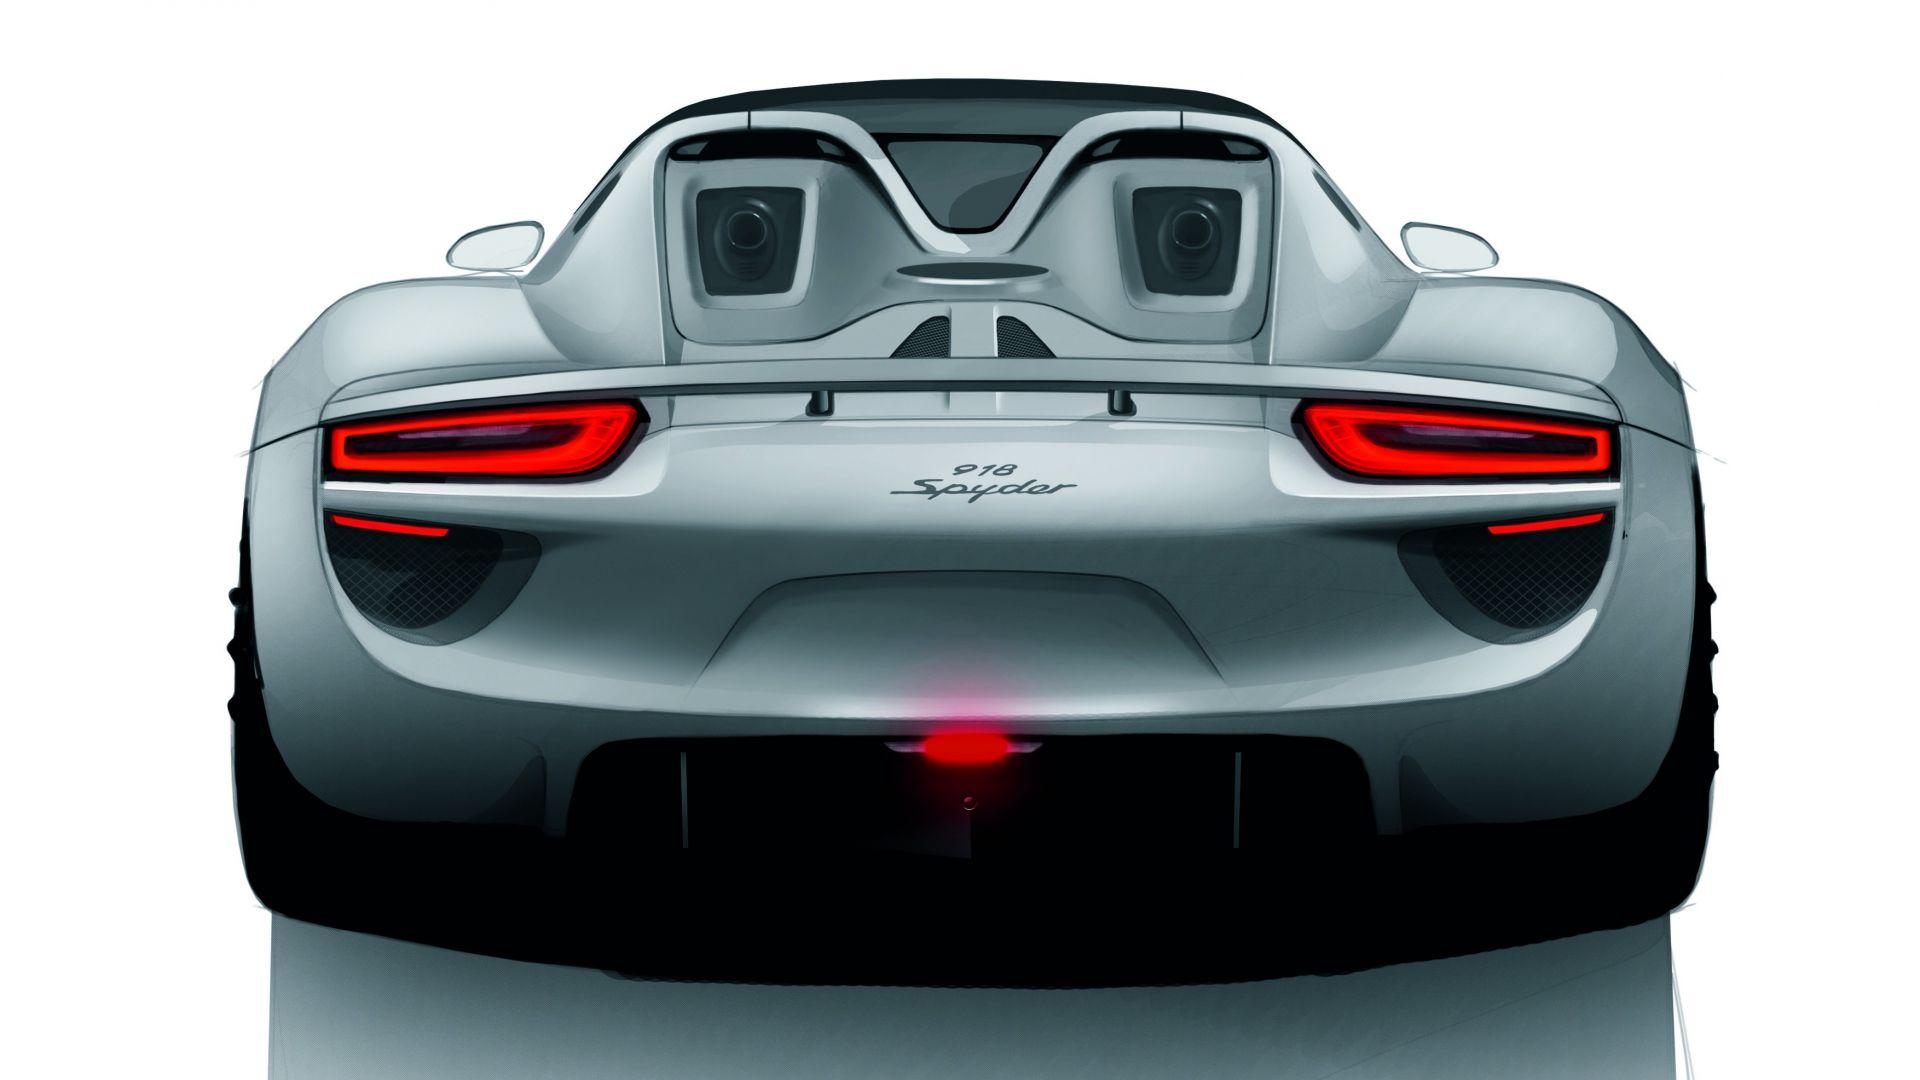 329702-16x9-lg Marvelous Porsche 918 Spyder Hybrid Prezzo Cars Trend